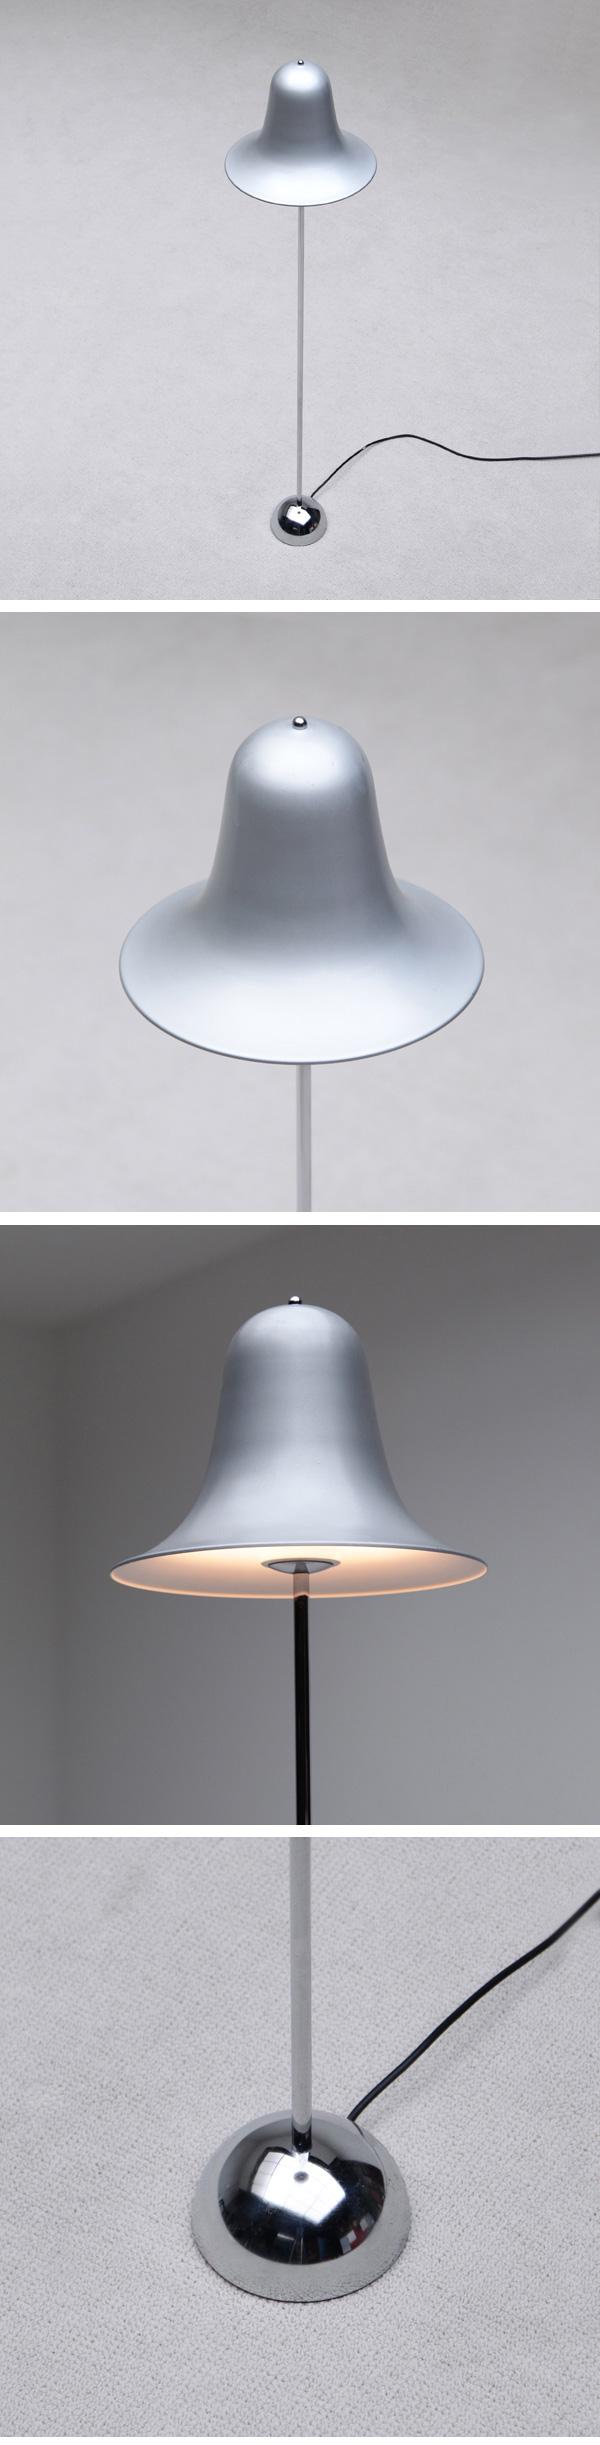 Verner Panton, Pantop, floor lamp, Verpan, luber